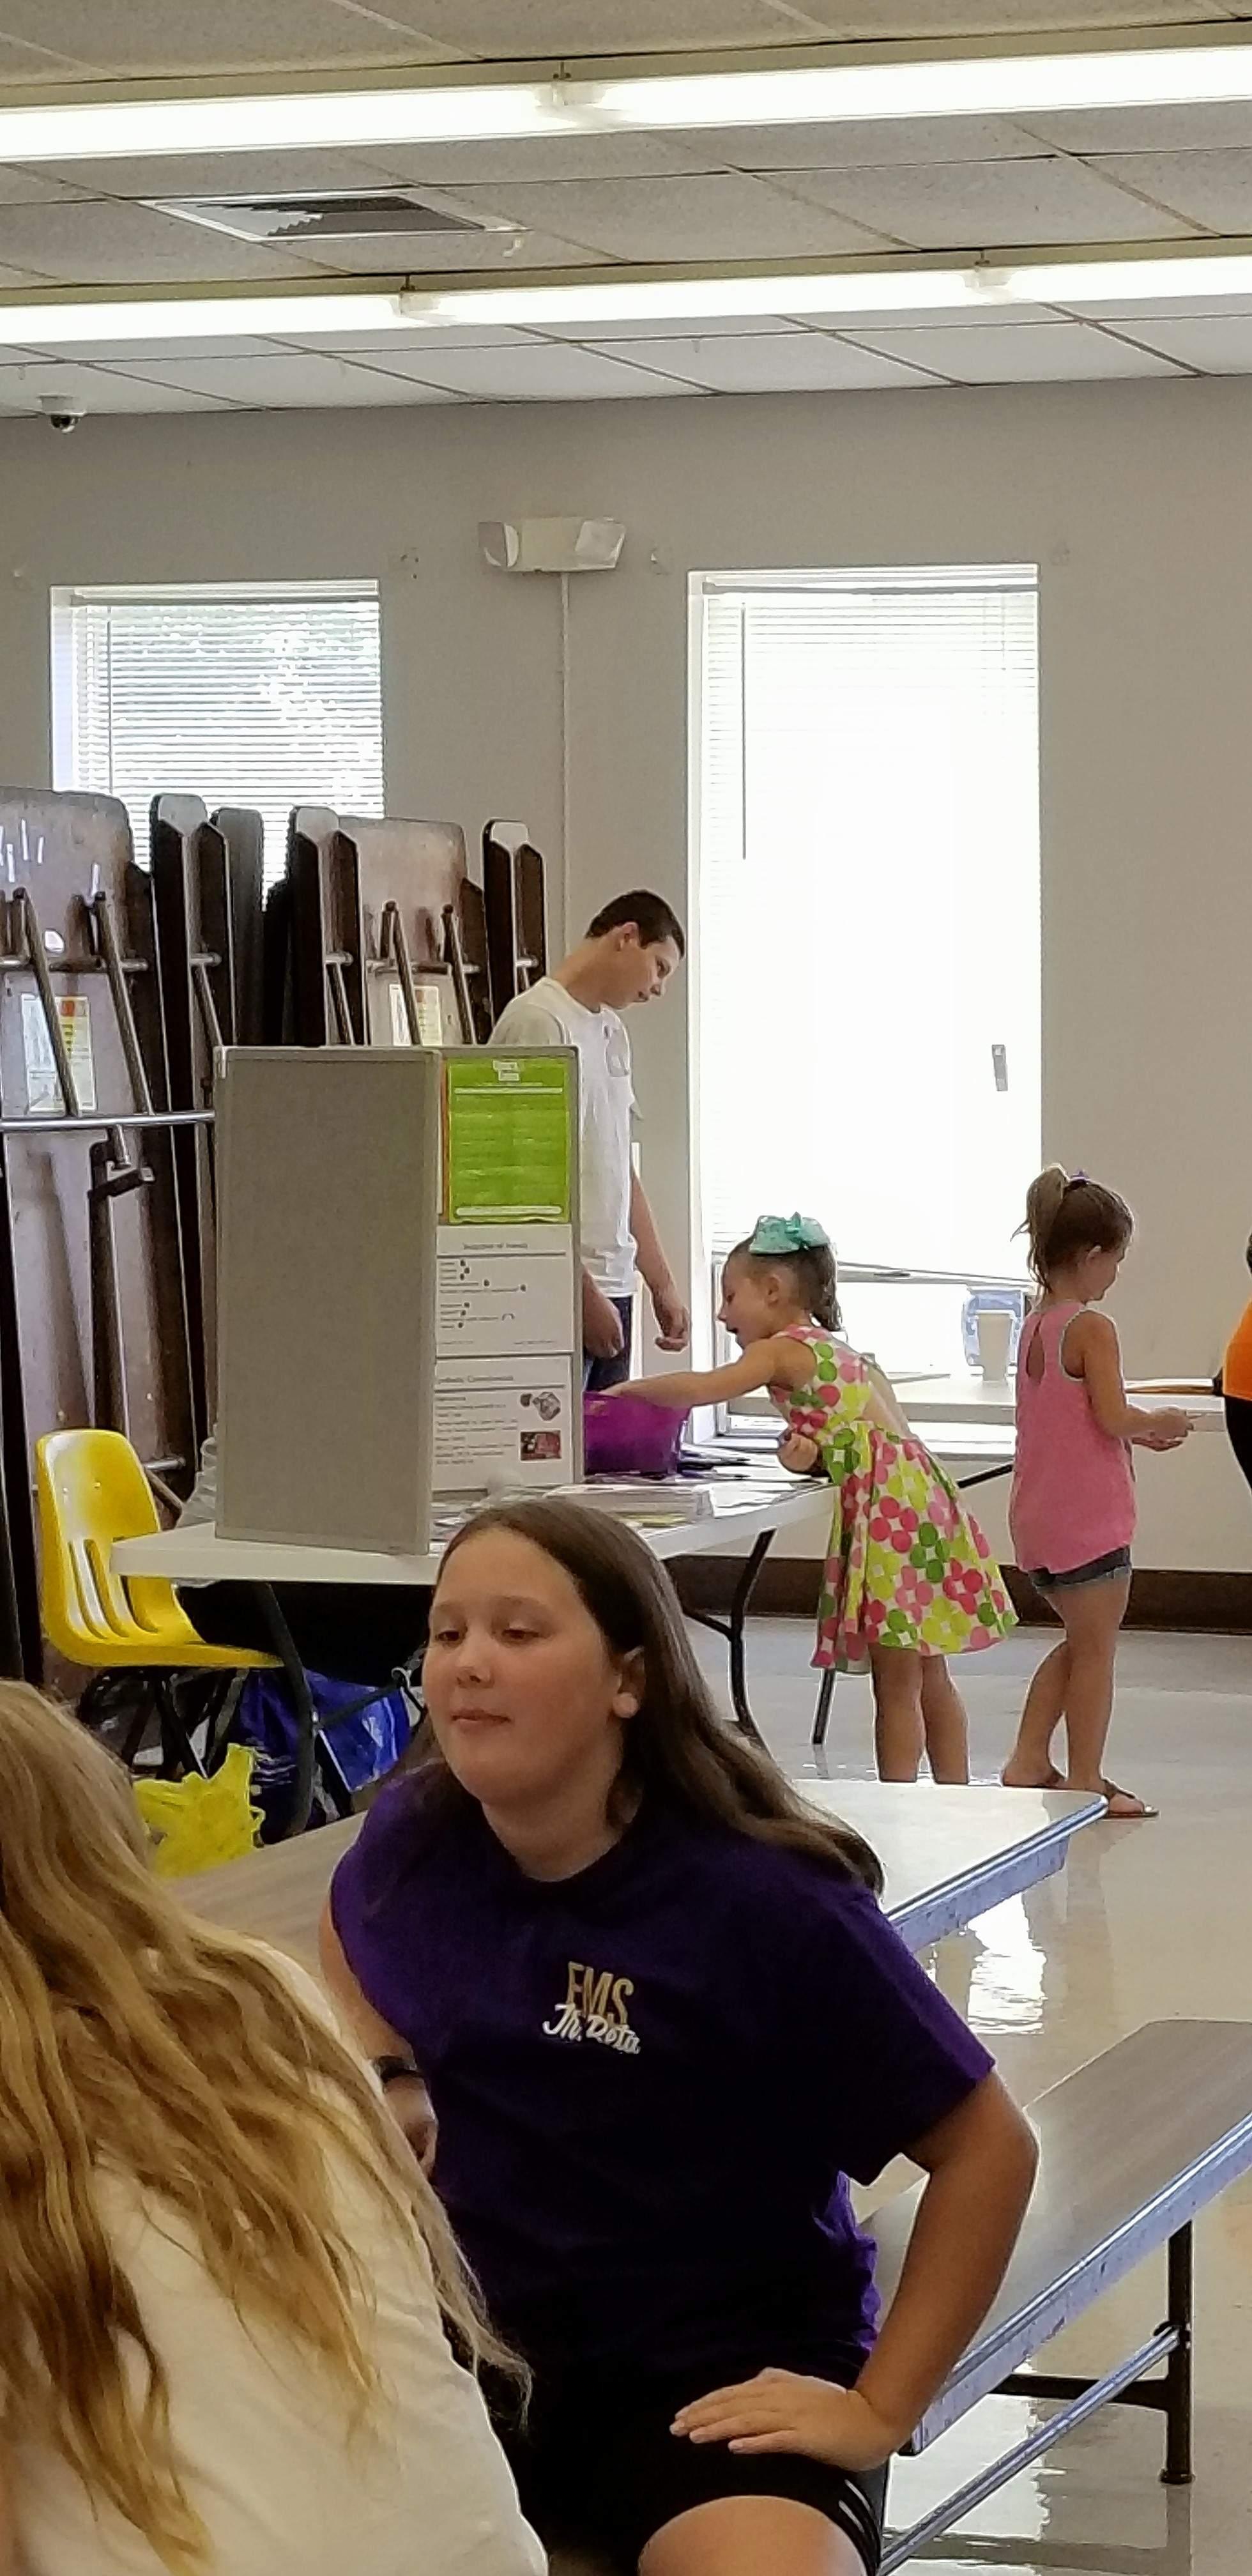 Junior Beta Club members assist during middle school registration.